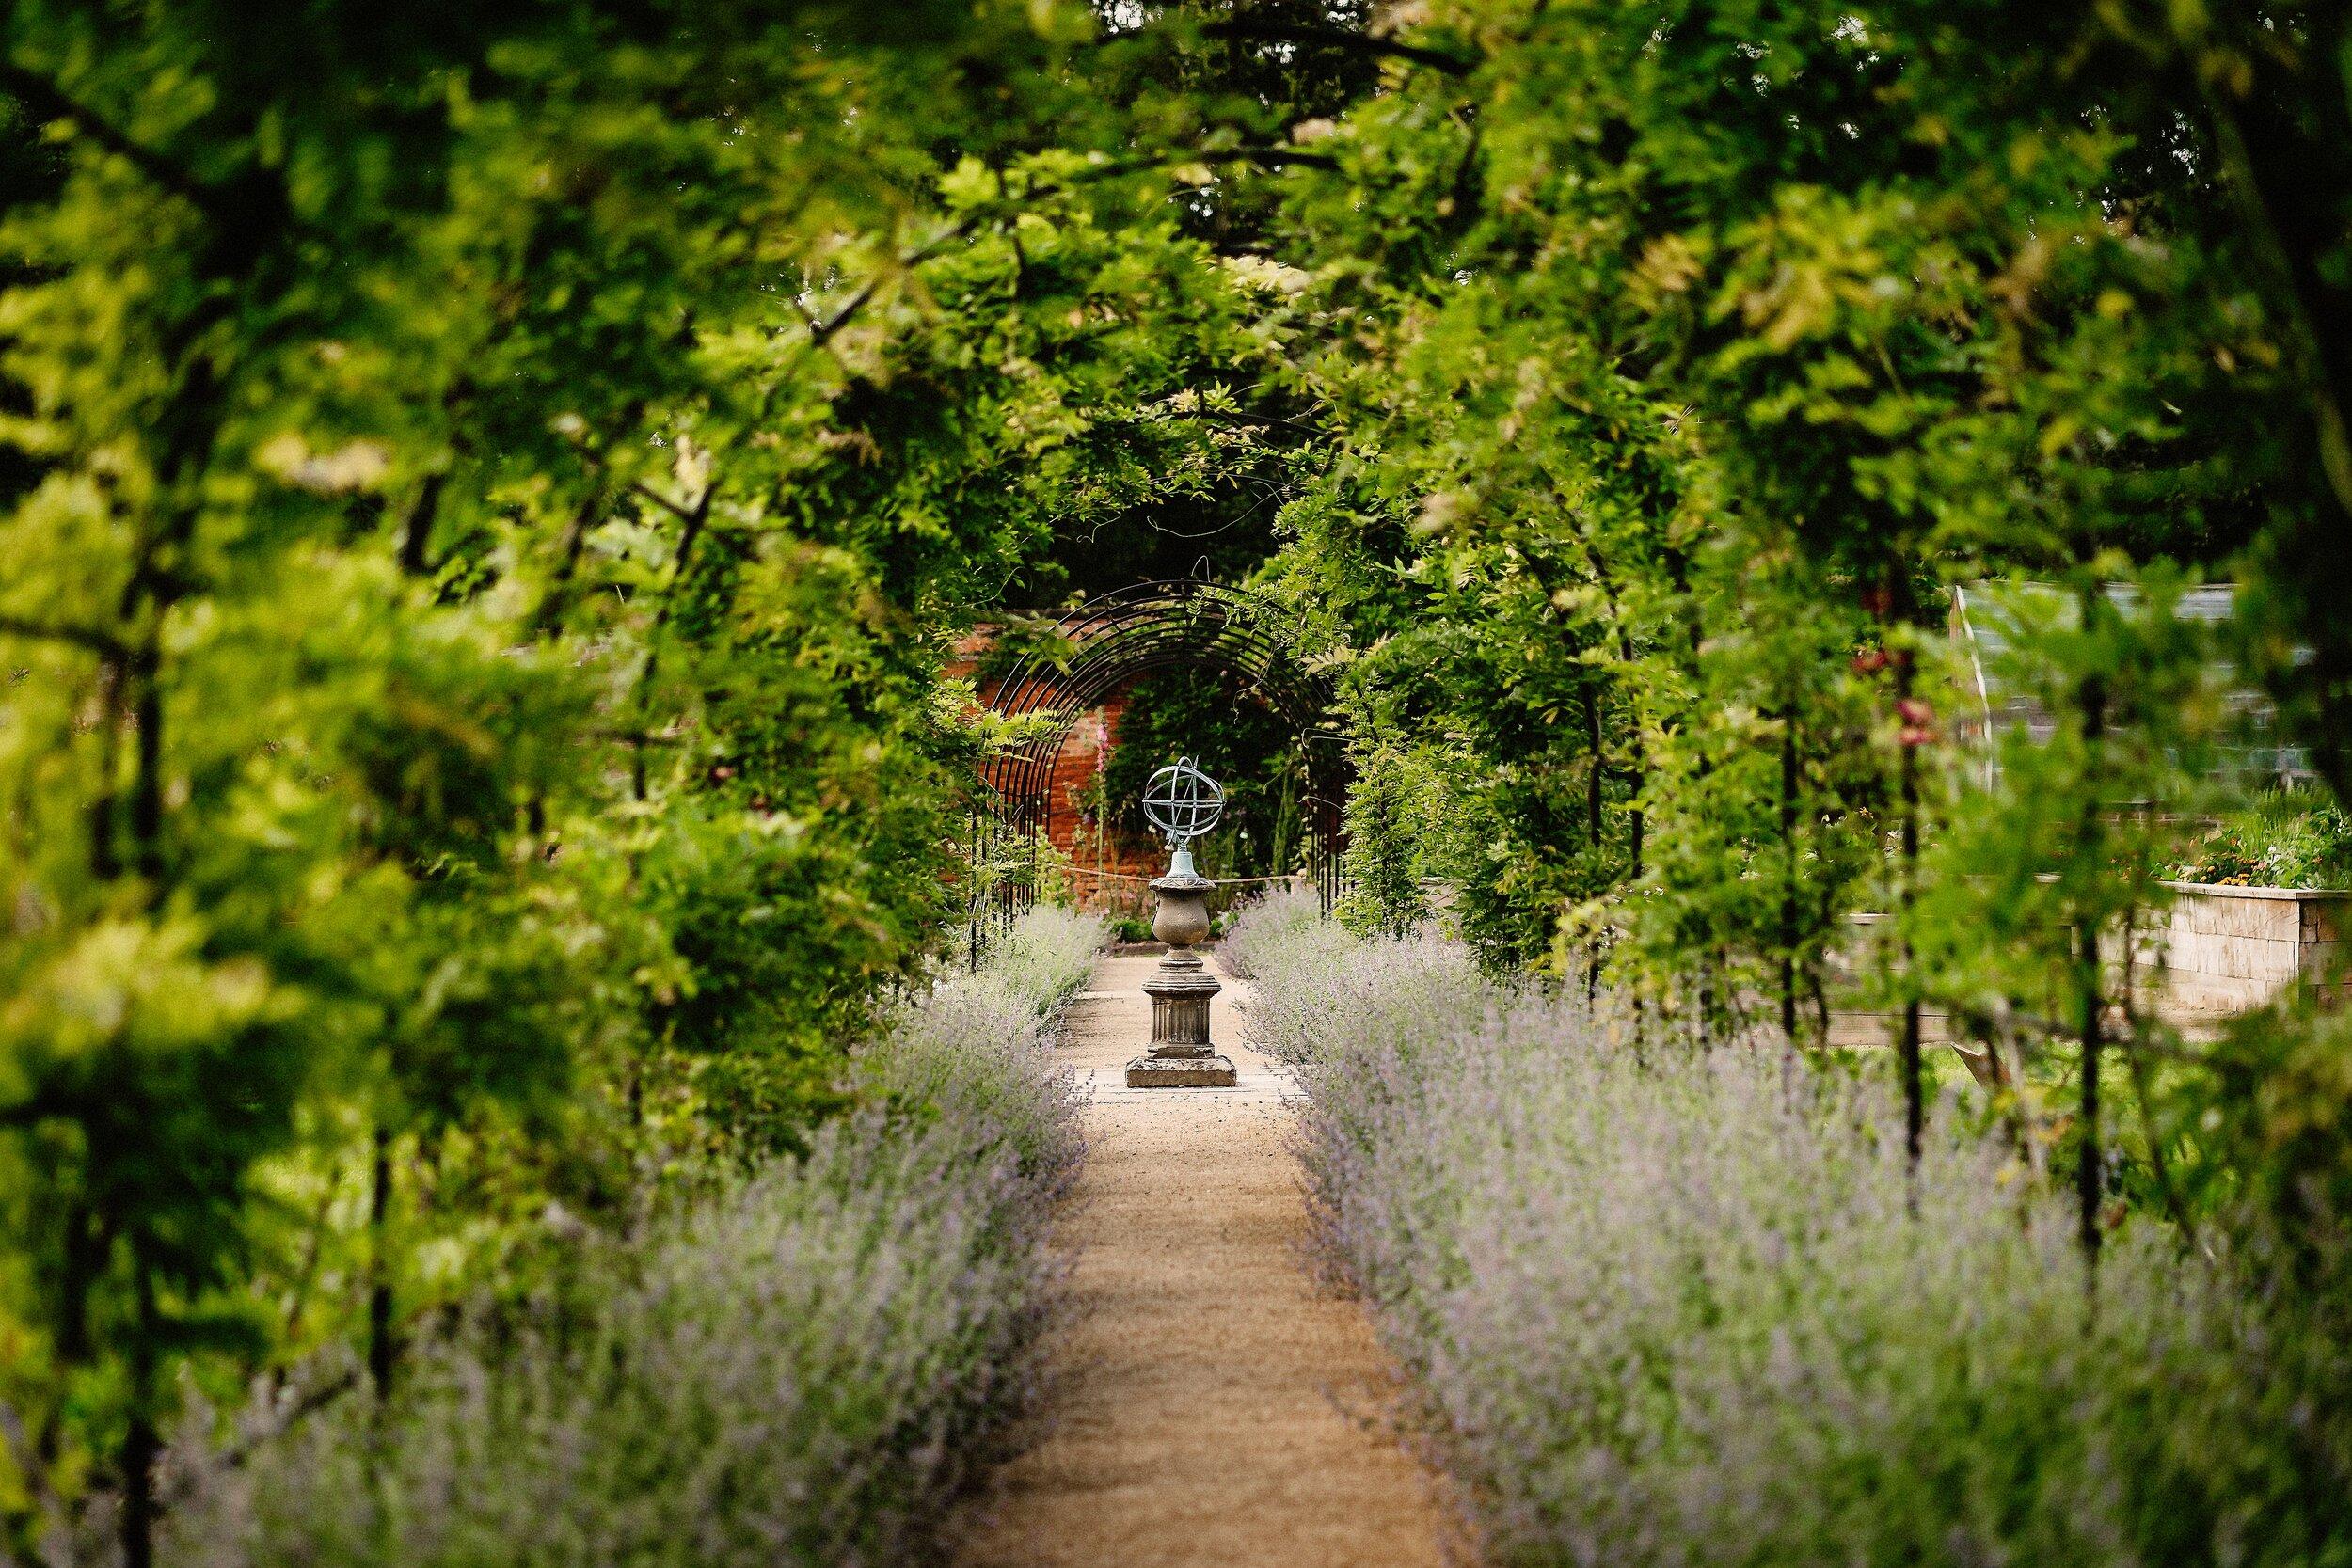 Thorpe Garden - Last of Light (Darren Gair) - Claire & David - 2.8.19 -190802 403.jpg